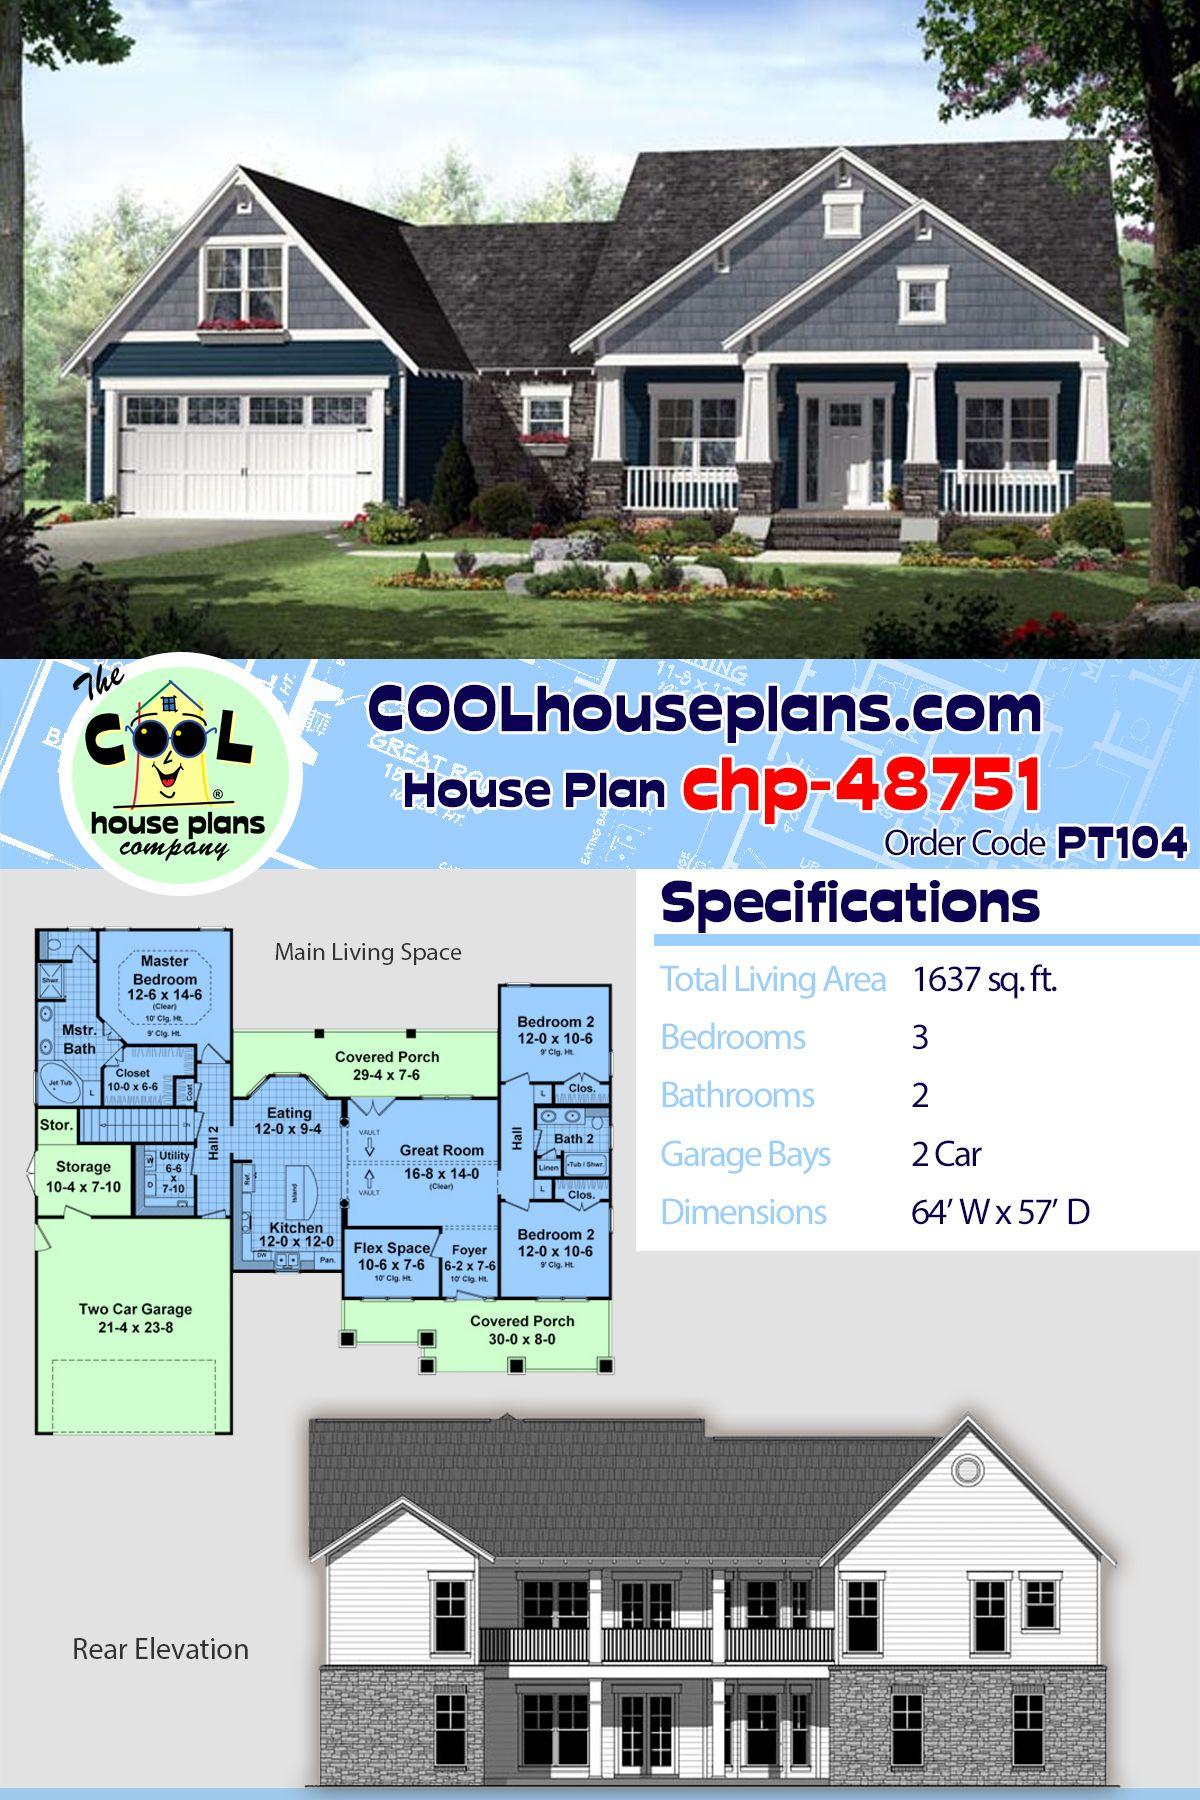 House Plan Chp 48751 Best House Plans Craftsman House Plans Craftsman House Plan